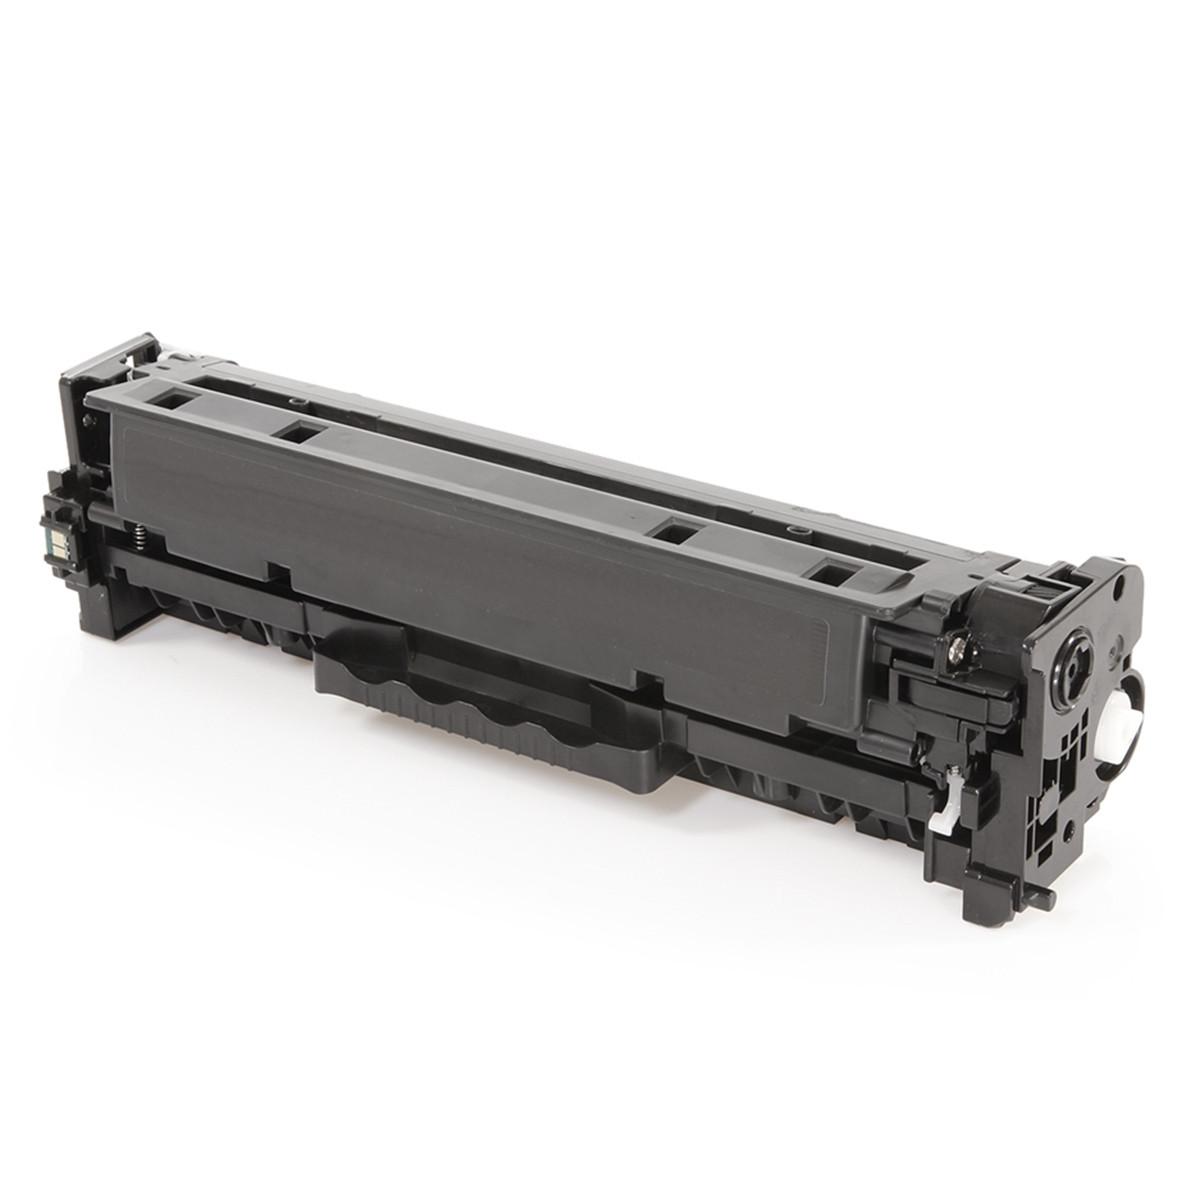 Toner Compatível com HP CE412A 305A Amarelo Universal | M451 M351 M475 M451DW | Premium 2.8k